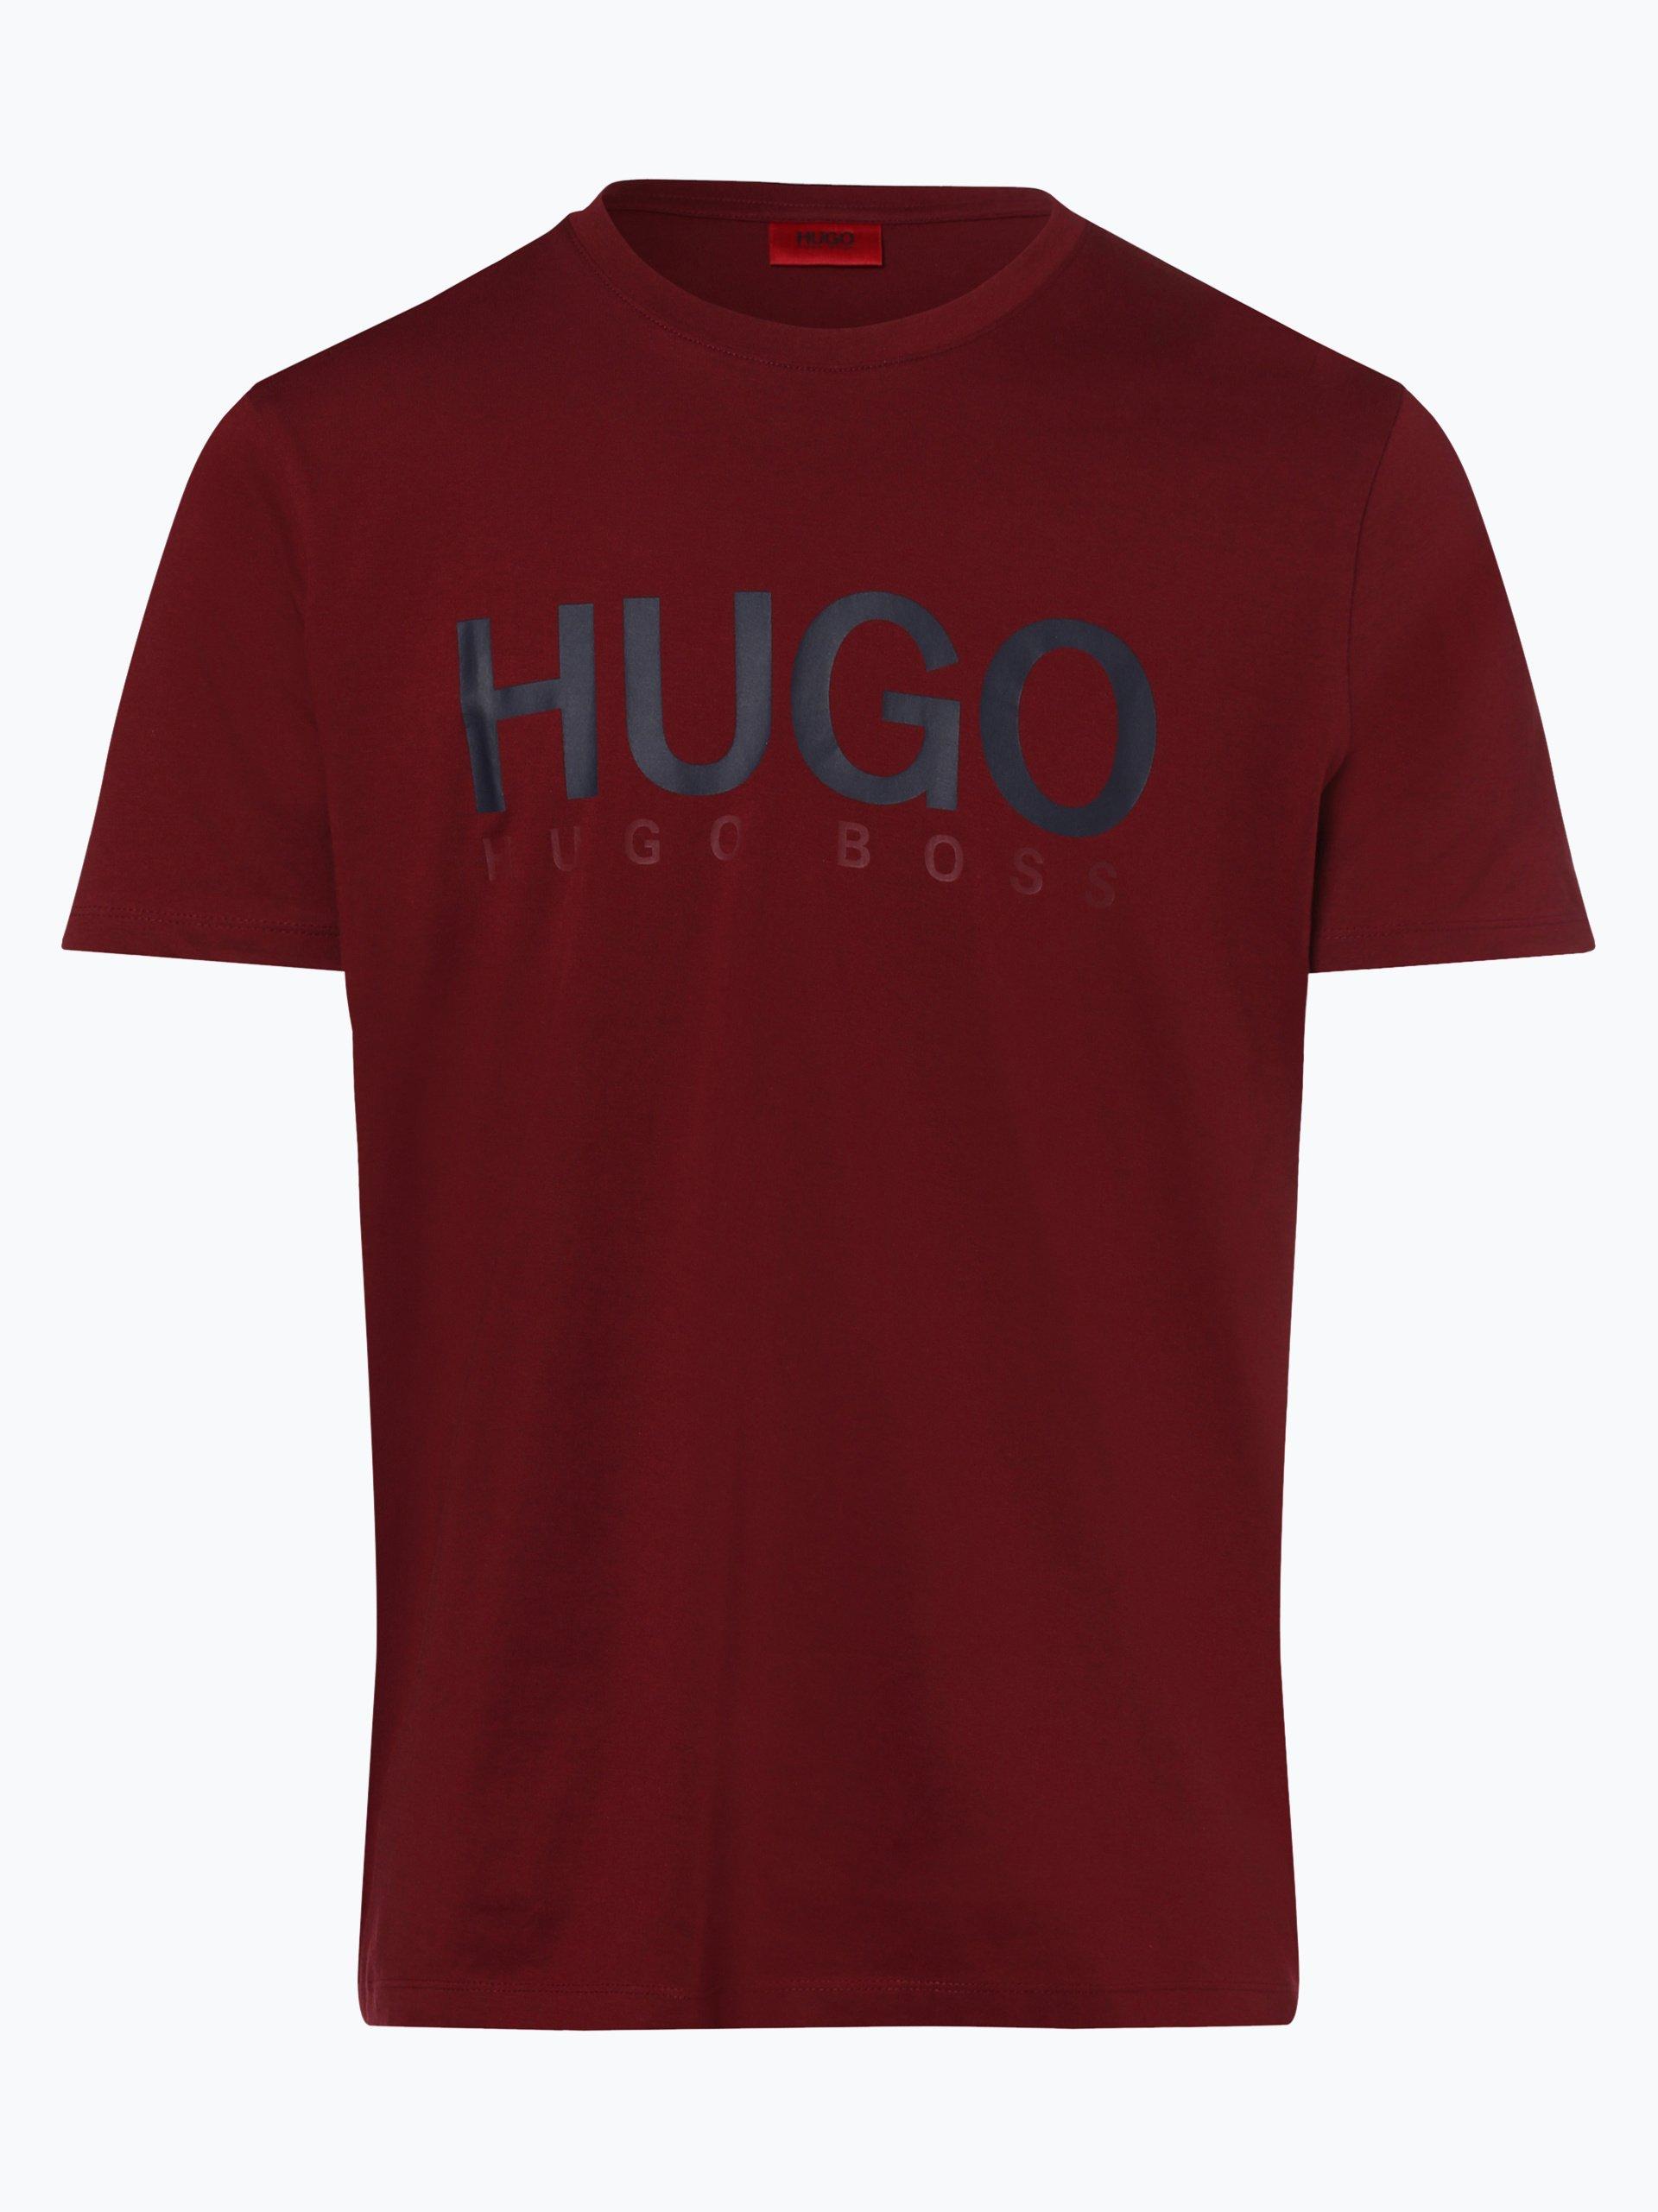 HUGO Herren T-Shirt - Dolive-U3